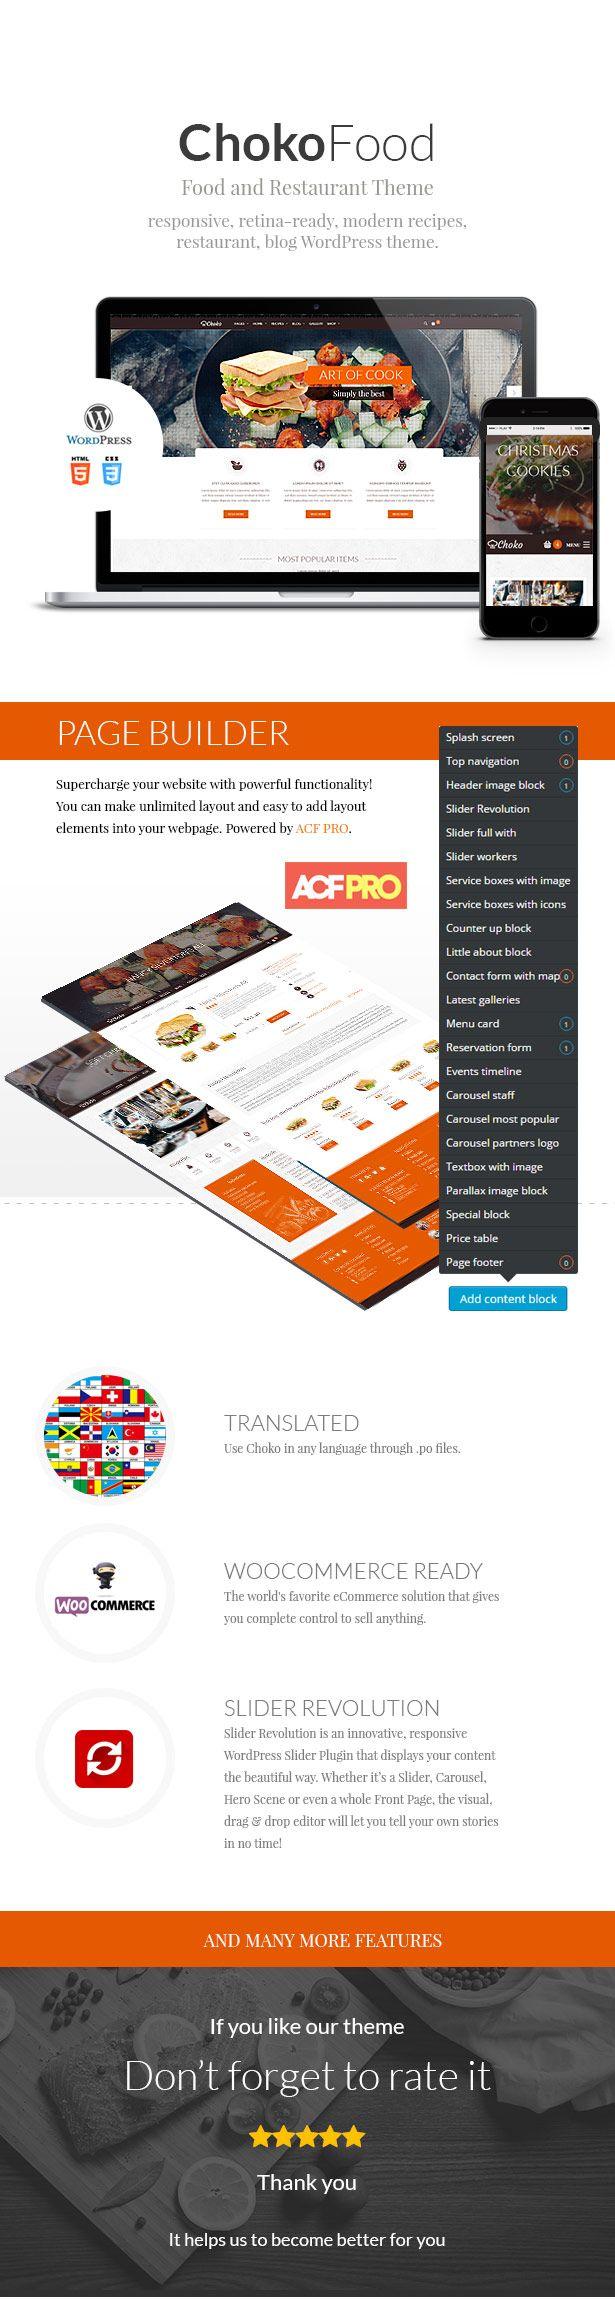 Chokofood – Food & Restaurant Wordpress Theme fresh and modern design for restaurant, chef or food blog. #food #blog #design #theme